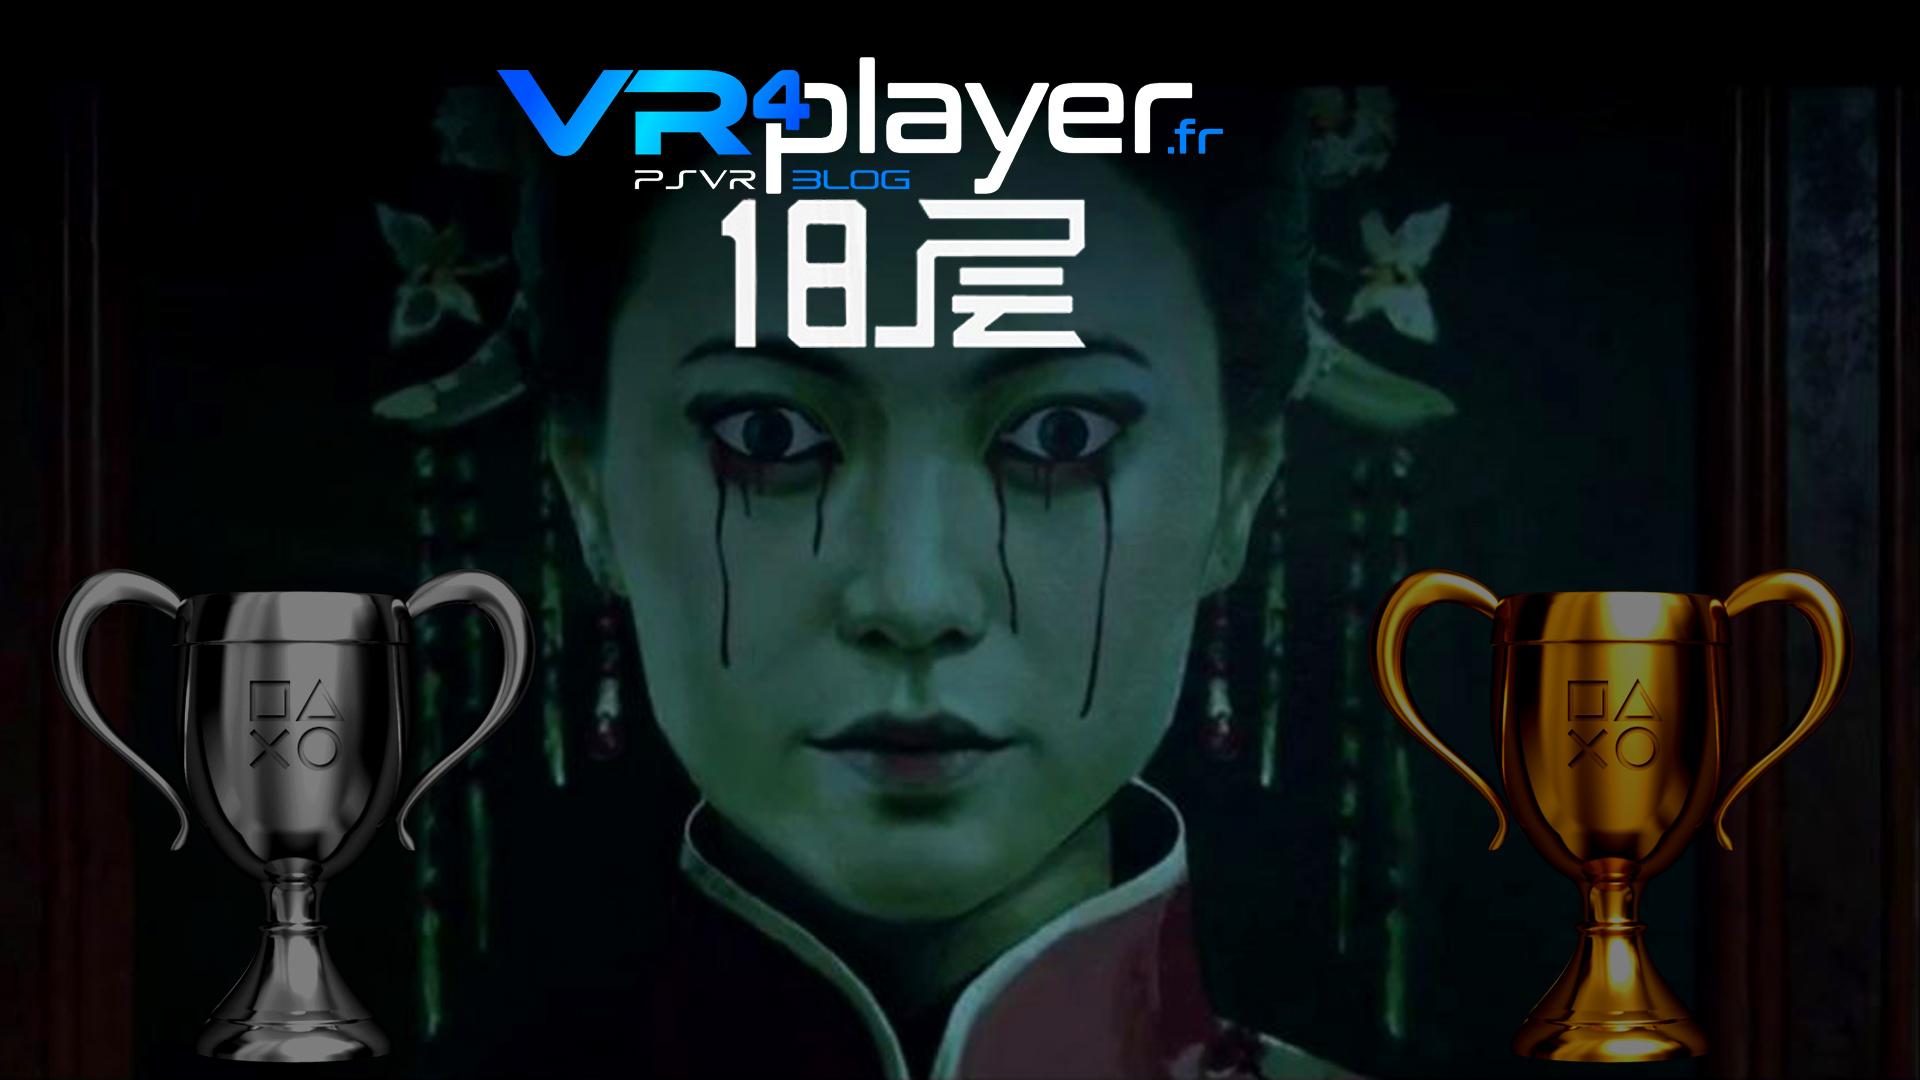 18 Floors, ses trophées sur PSVR vr4player.fr